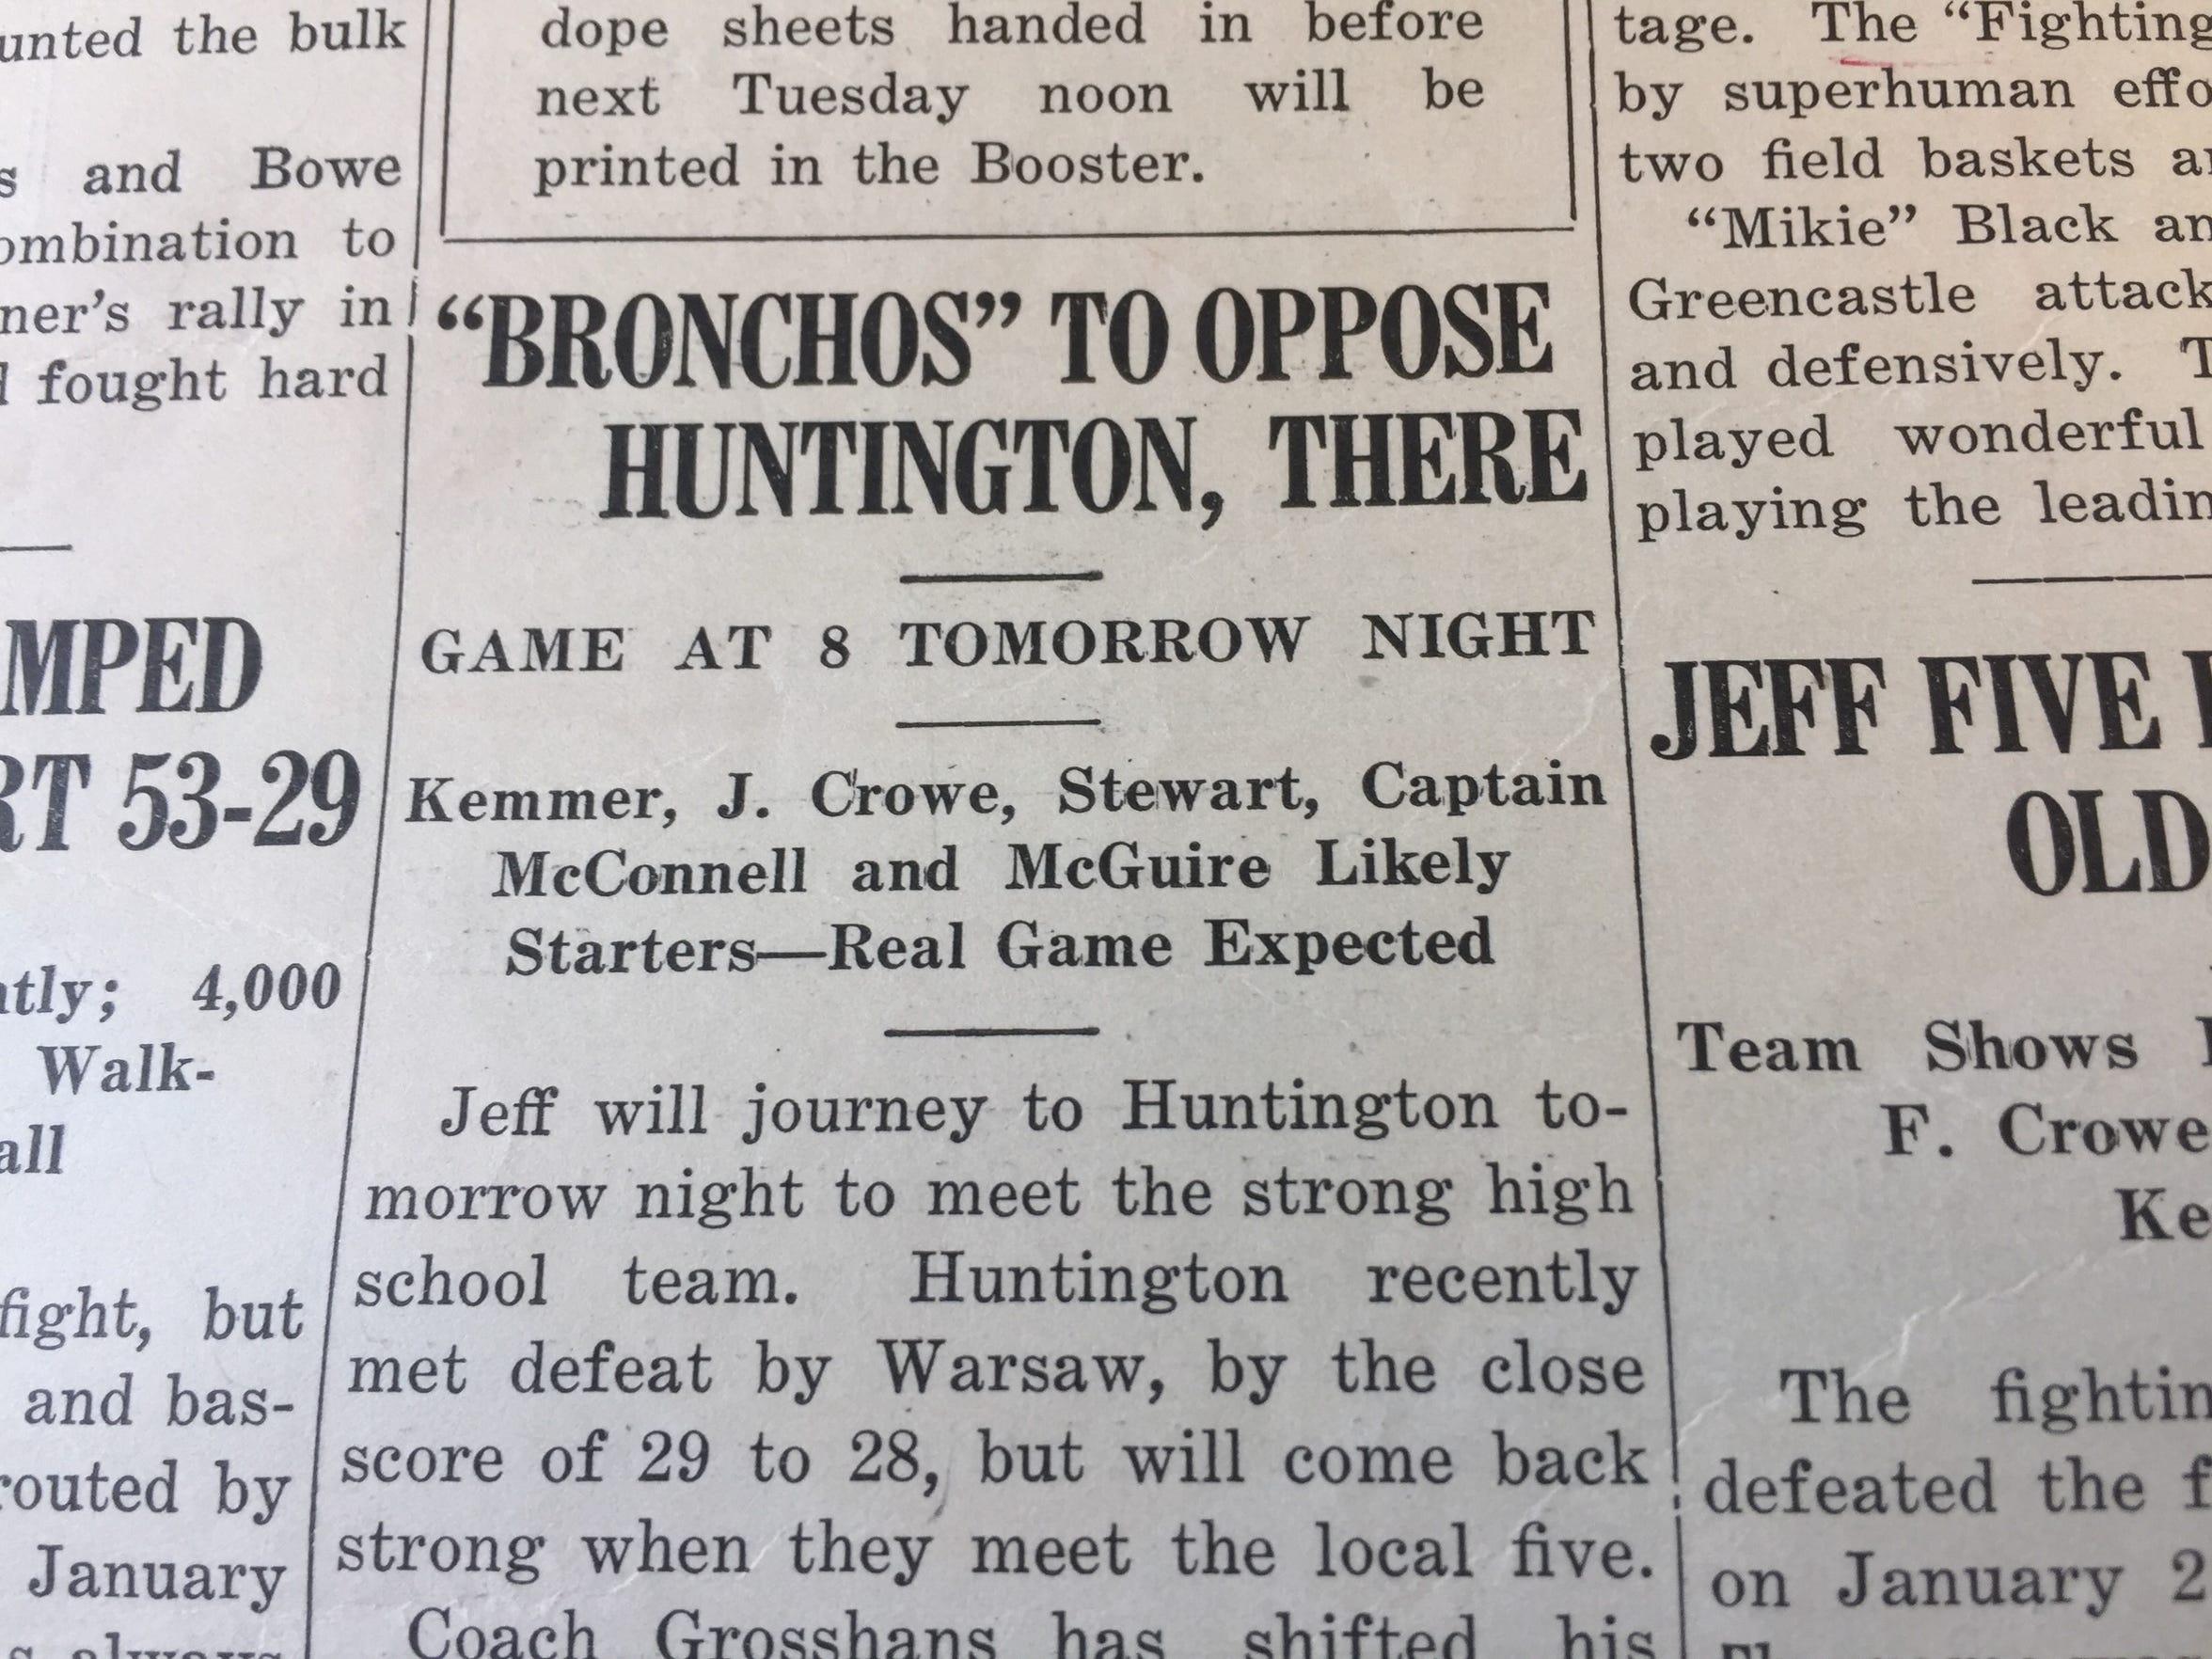 The Booster, Lafayette Jeff's school newspaper, put